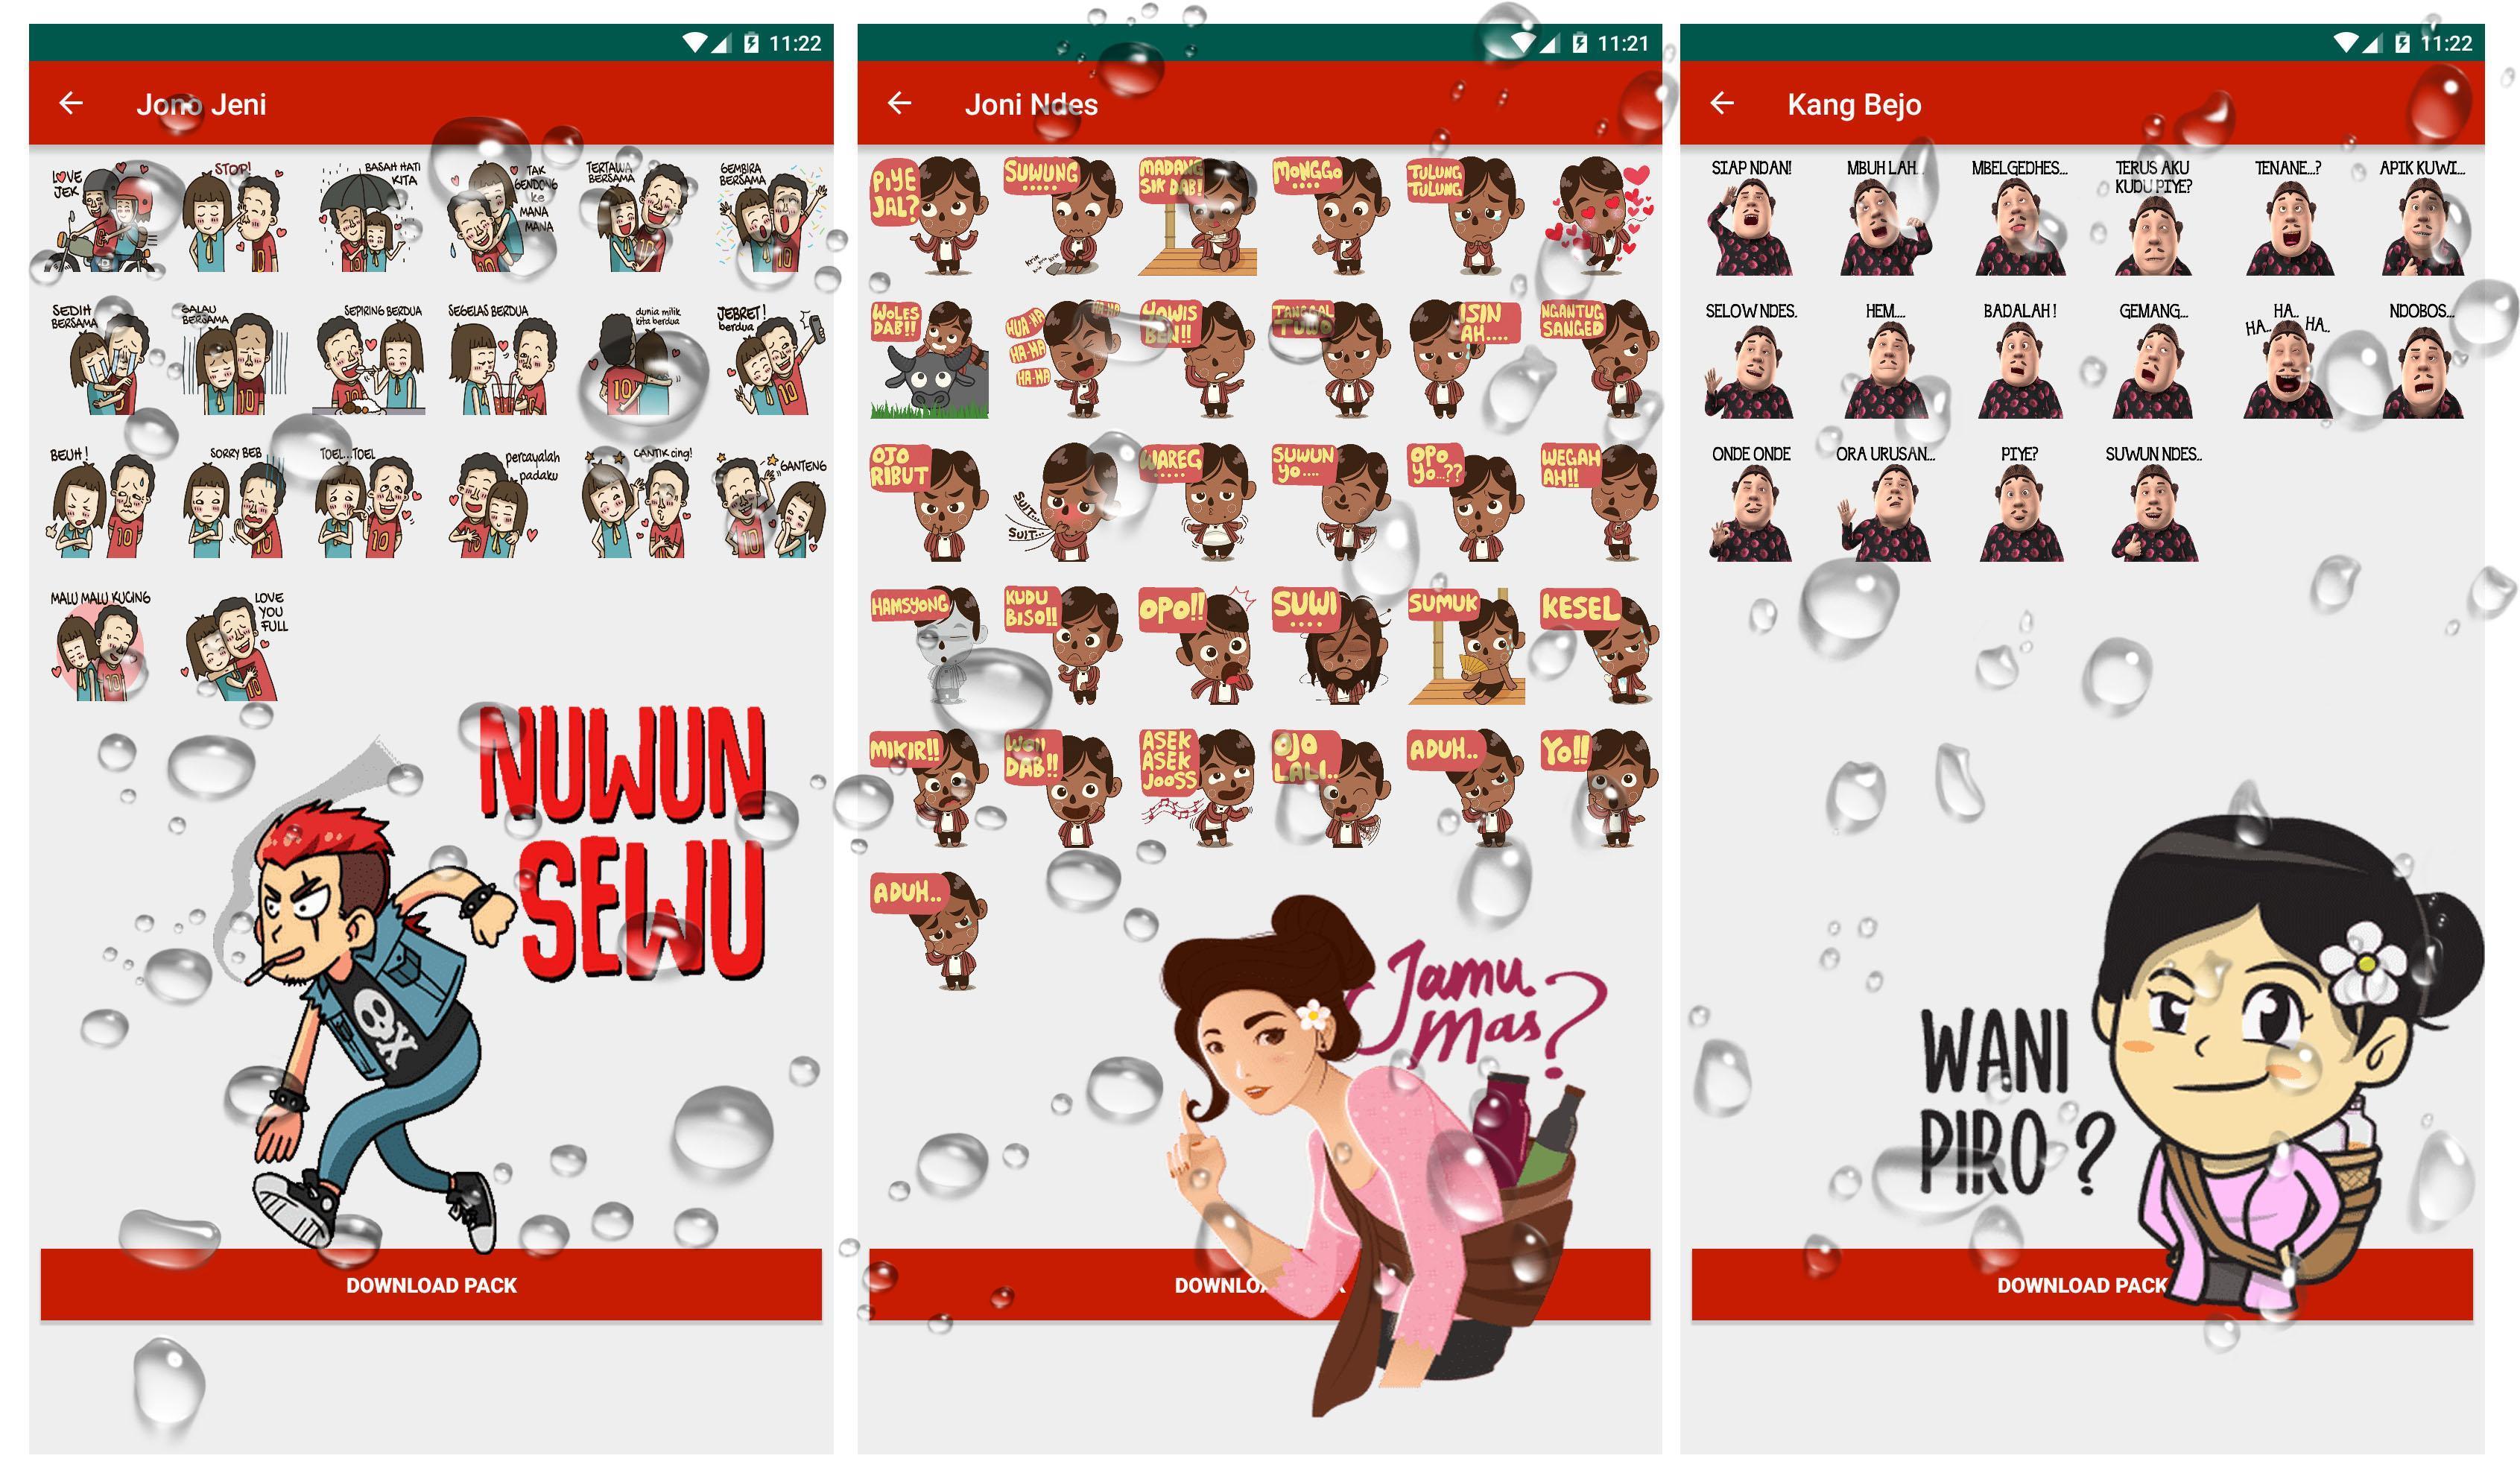 WA Sticker Jowo Guyonan Jawa for WhatsApp for Android APK